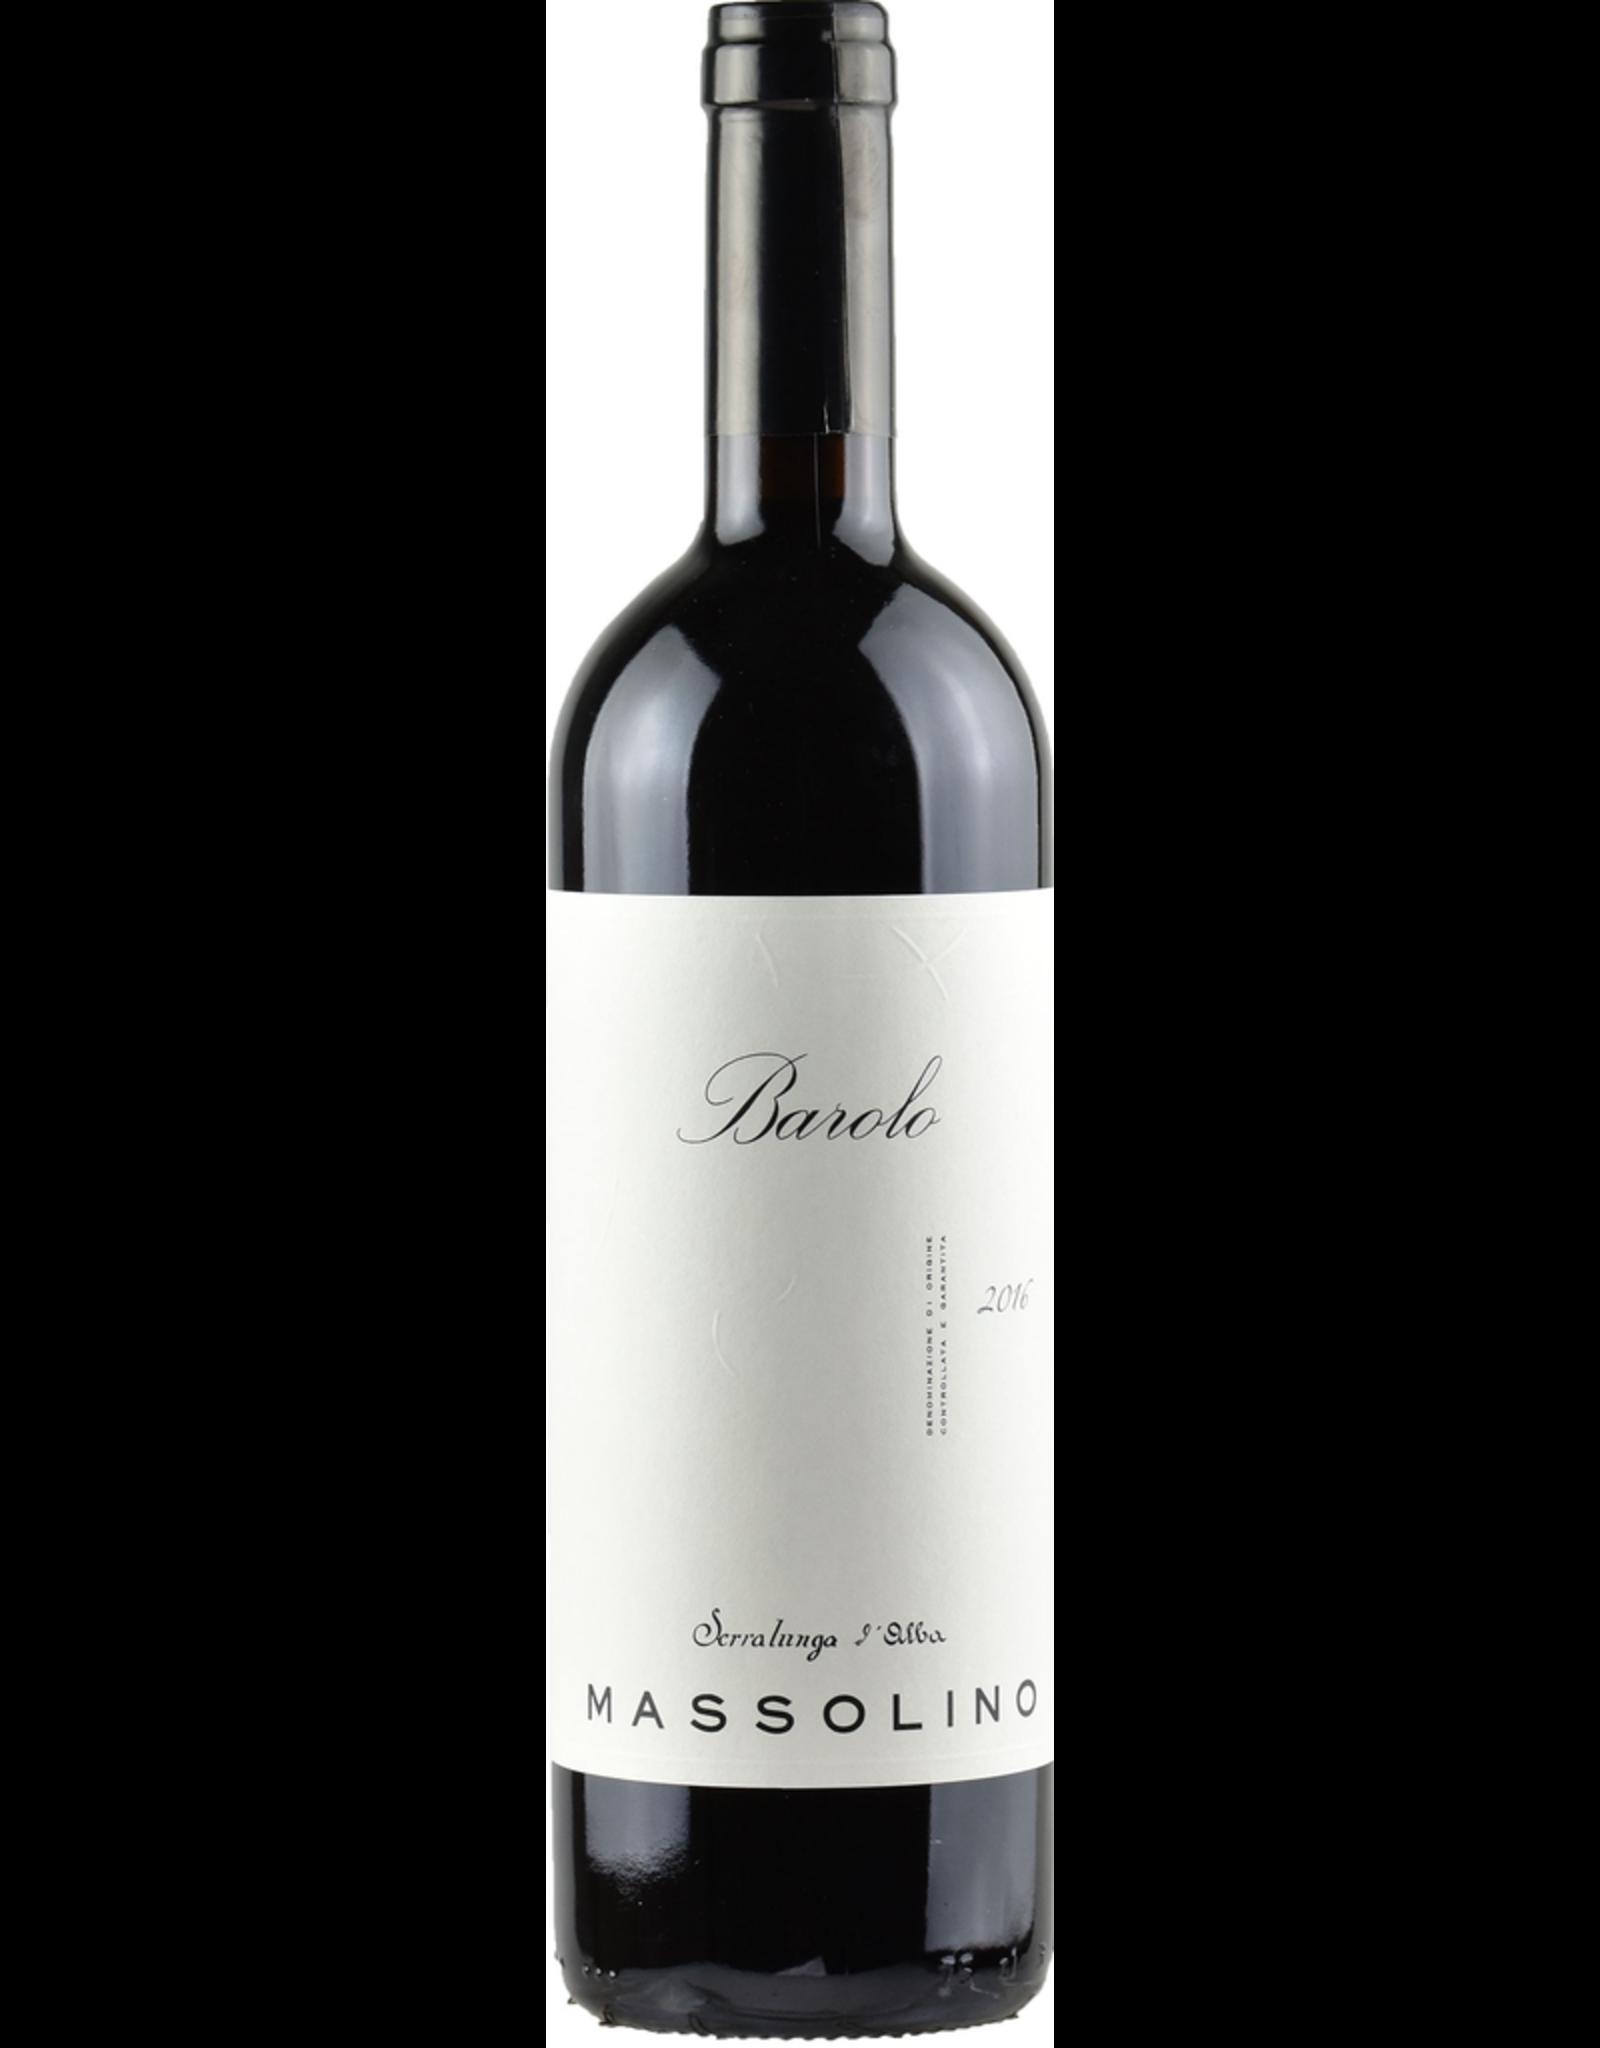 Red Wine 2016, Massolino, Nebbiolo, Barolo Serralunga, Piemonte, Italy, 14% Alc, #7 Wine Spectator TOP 100 2020 CTnr WS95 RP94